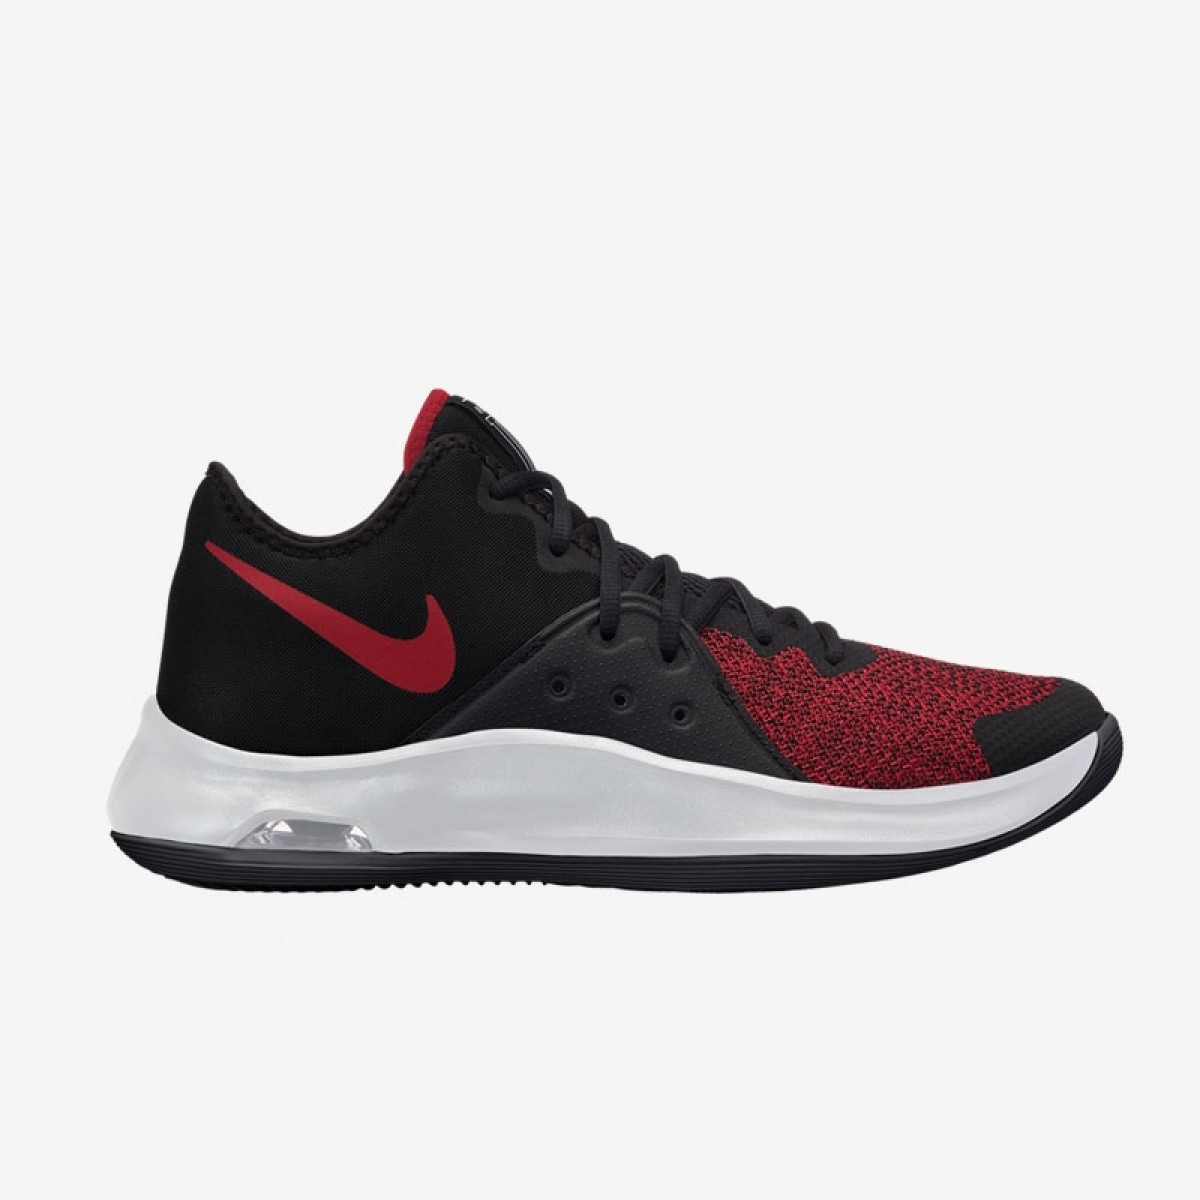 Nike Air Versitile III 'Bred'